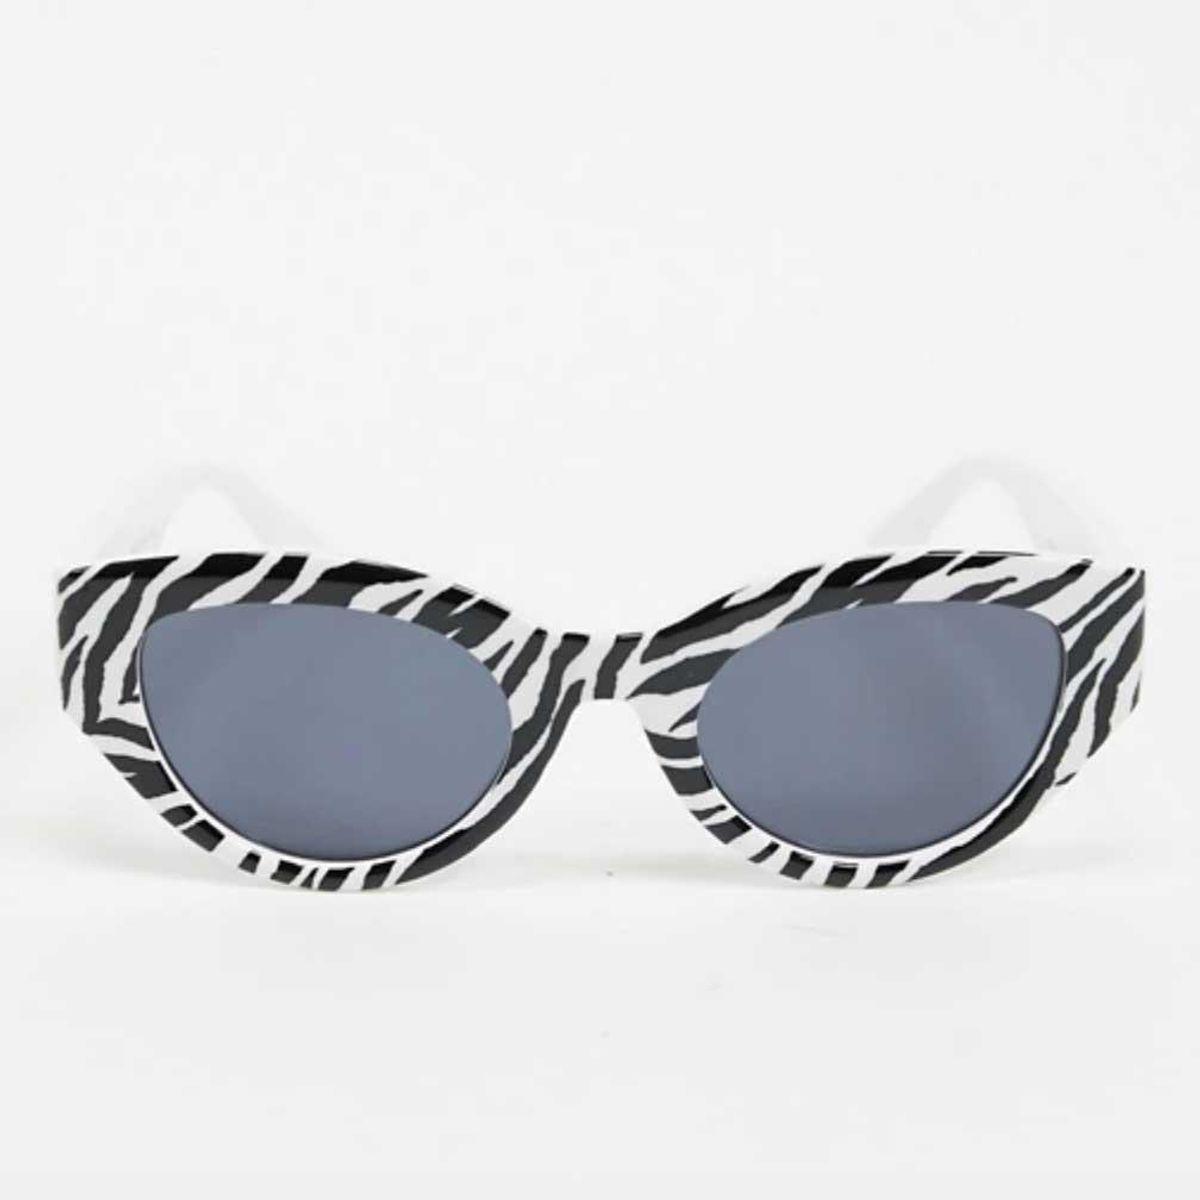 aj morgan retro oval cats eye sunglasses